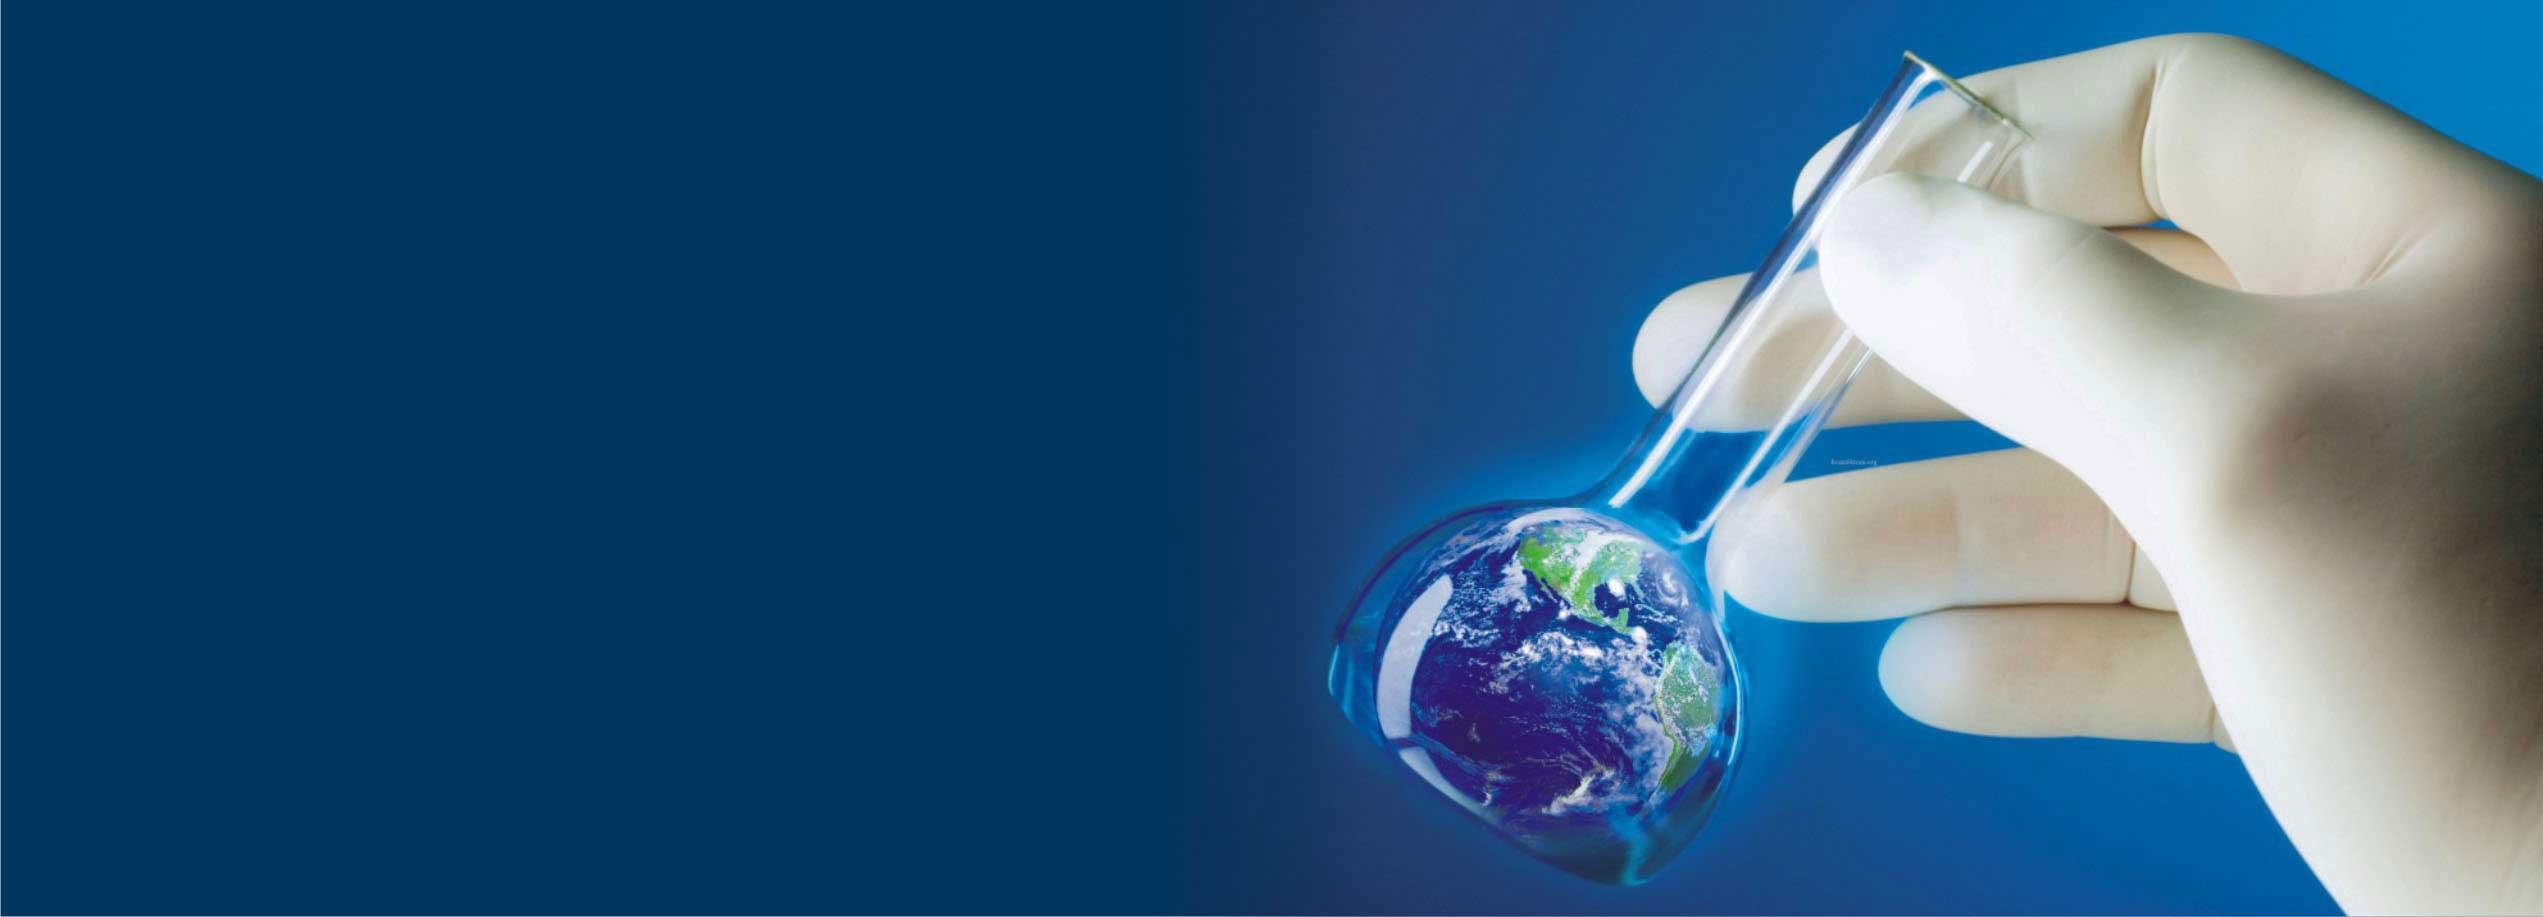 Zytras Life Sciences Dry Syrup Sachets Powder Segment